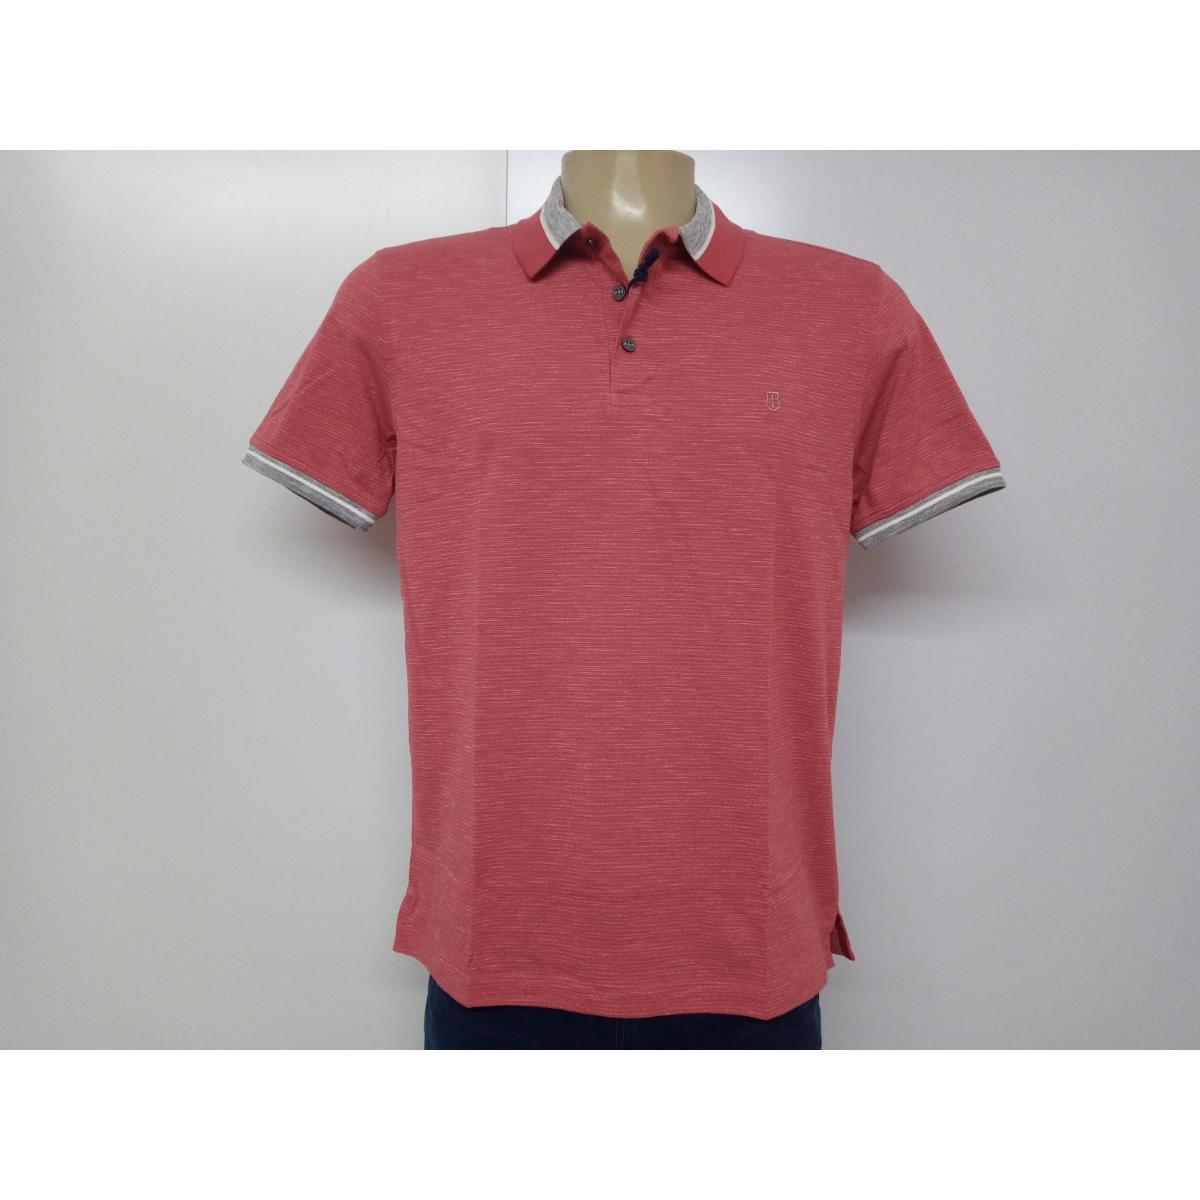 Camiseta Masculina Individual 08.75.0910.13 Vermelho